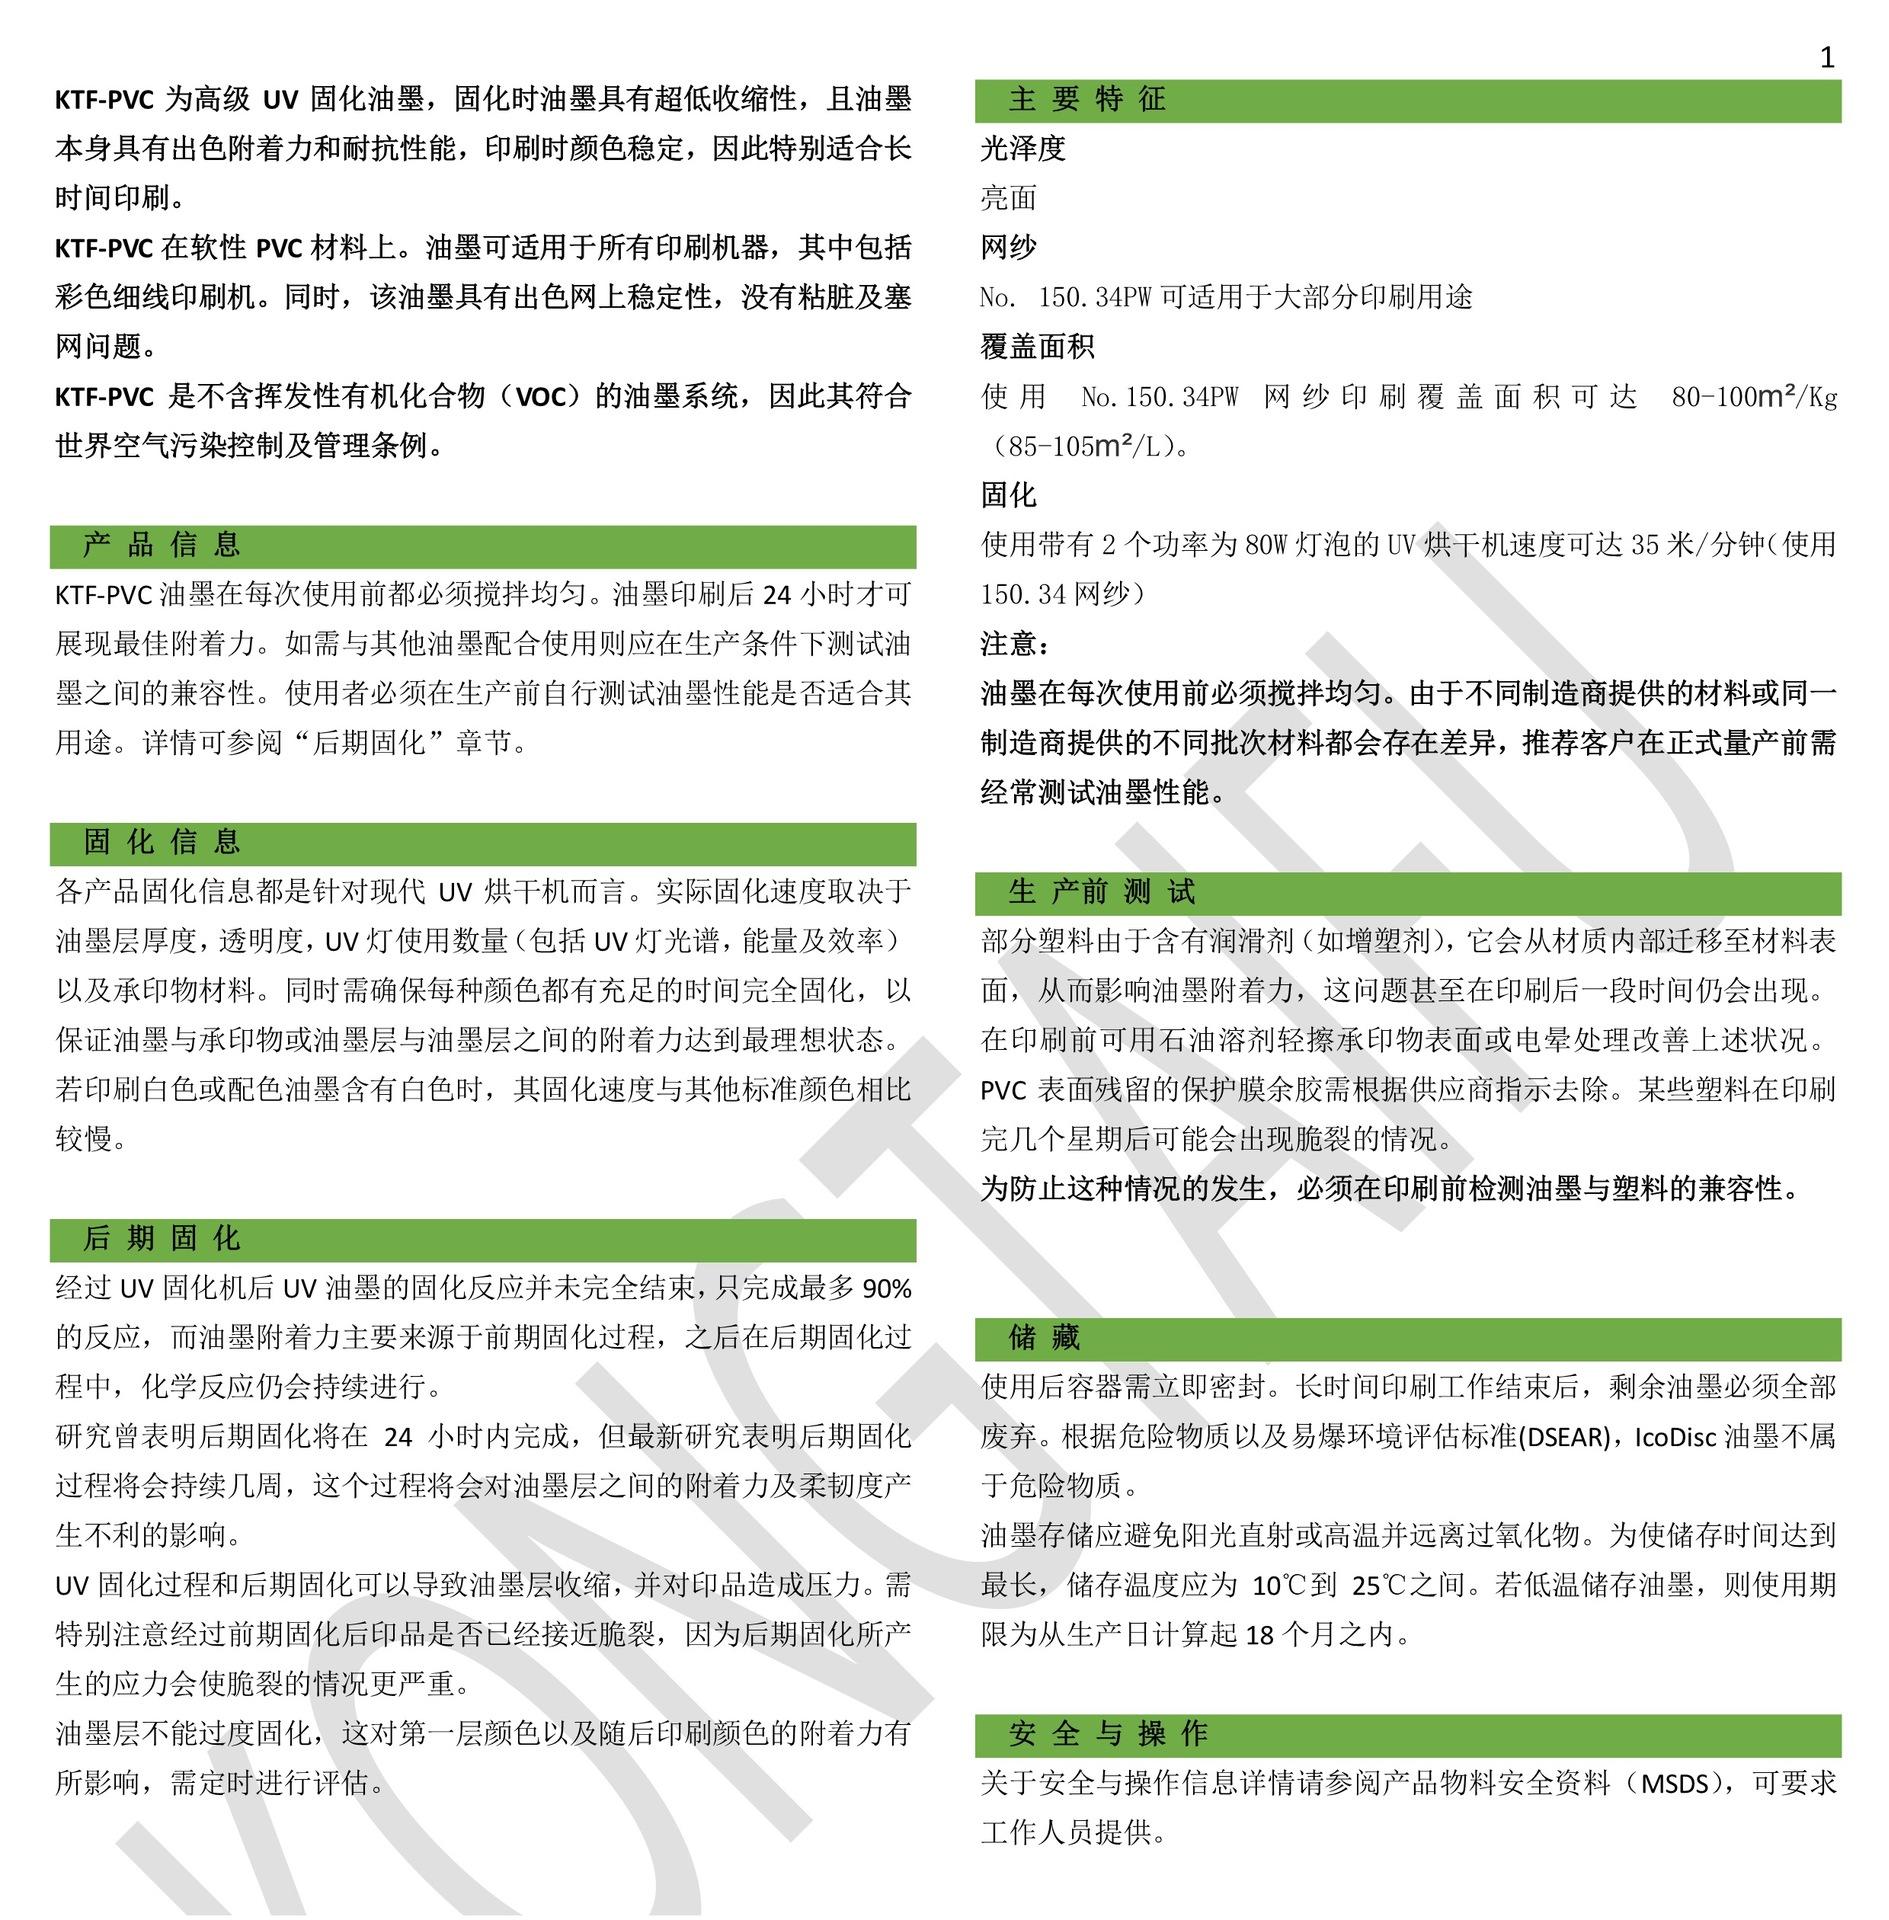 KTF-PVC-CN-kongtaifu-简体